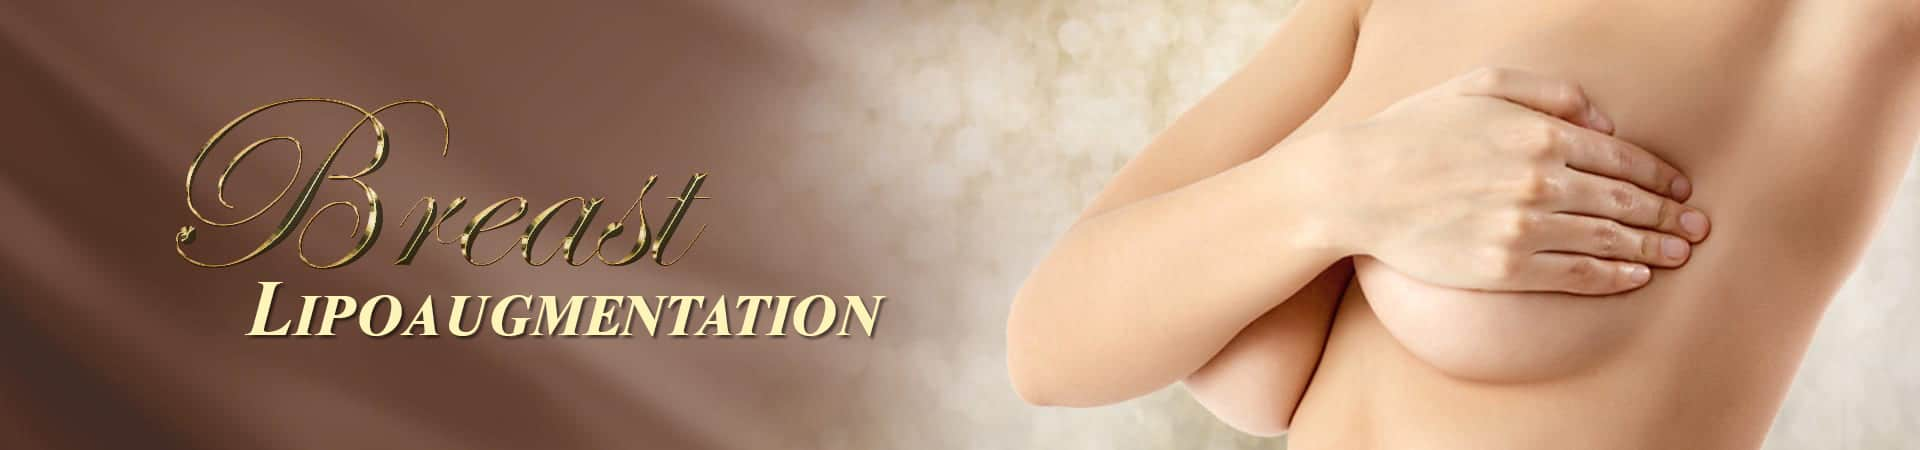 lipoaugmentation -fat transfer